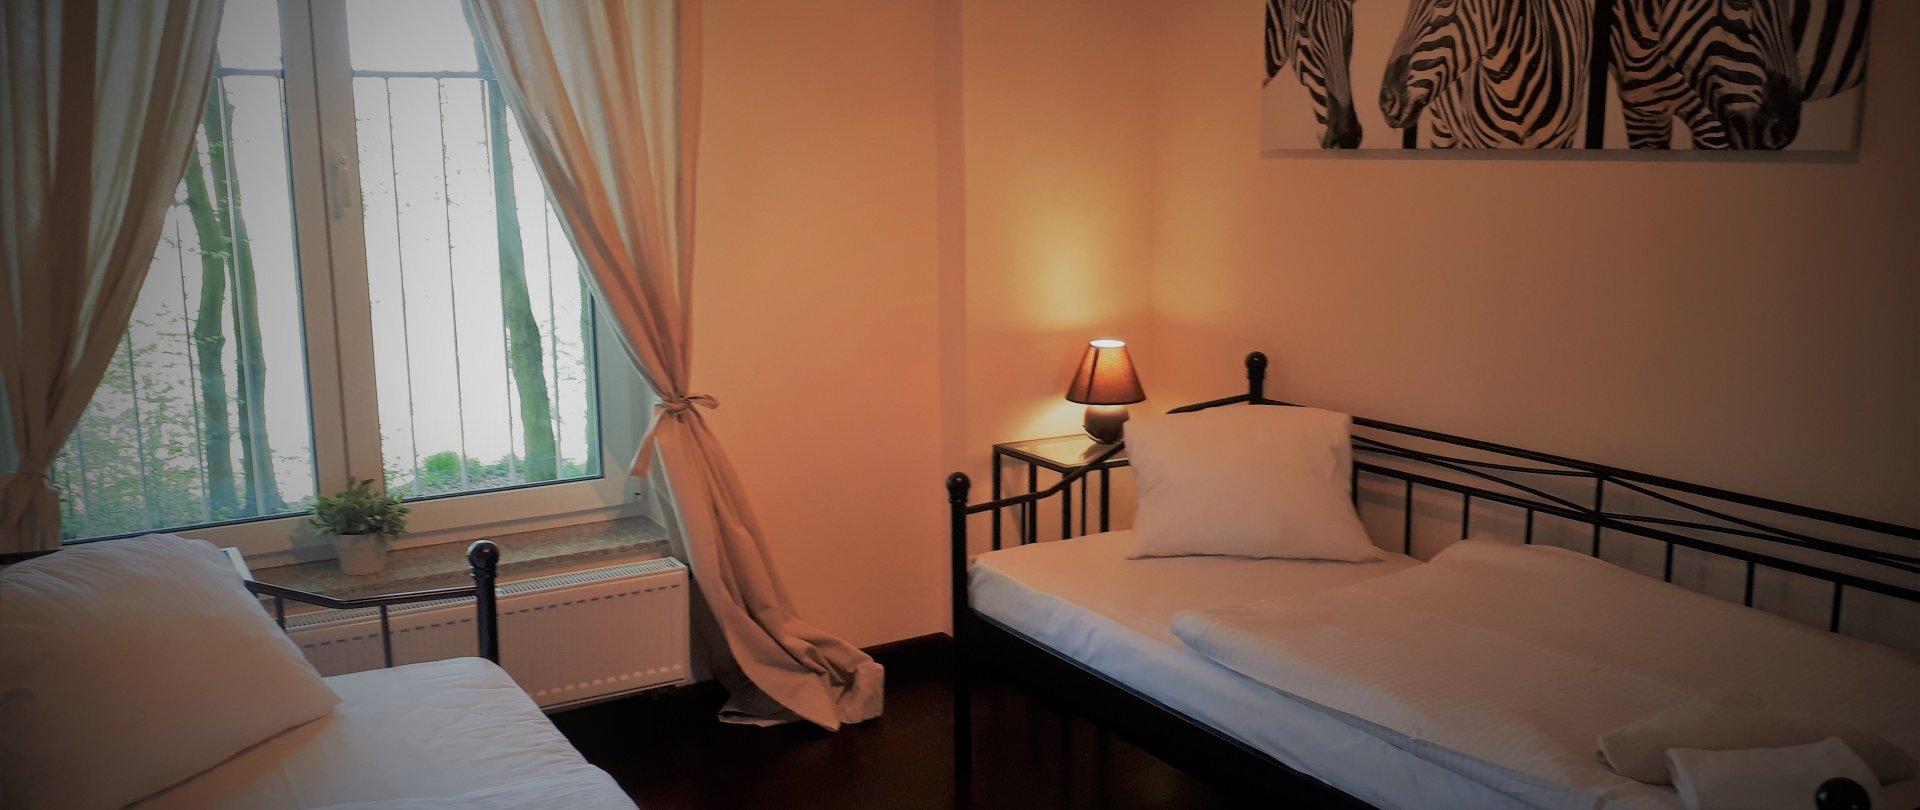 Apartmán SUPERIOR s 2 ložnicemi bez balkonu